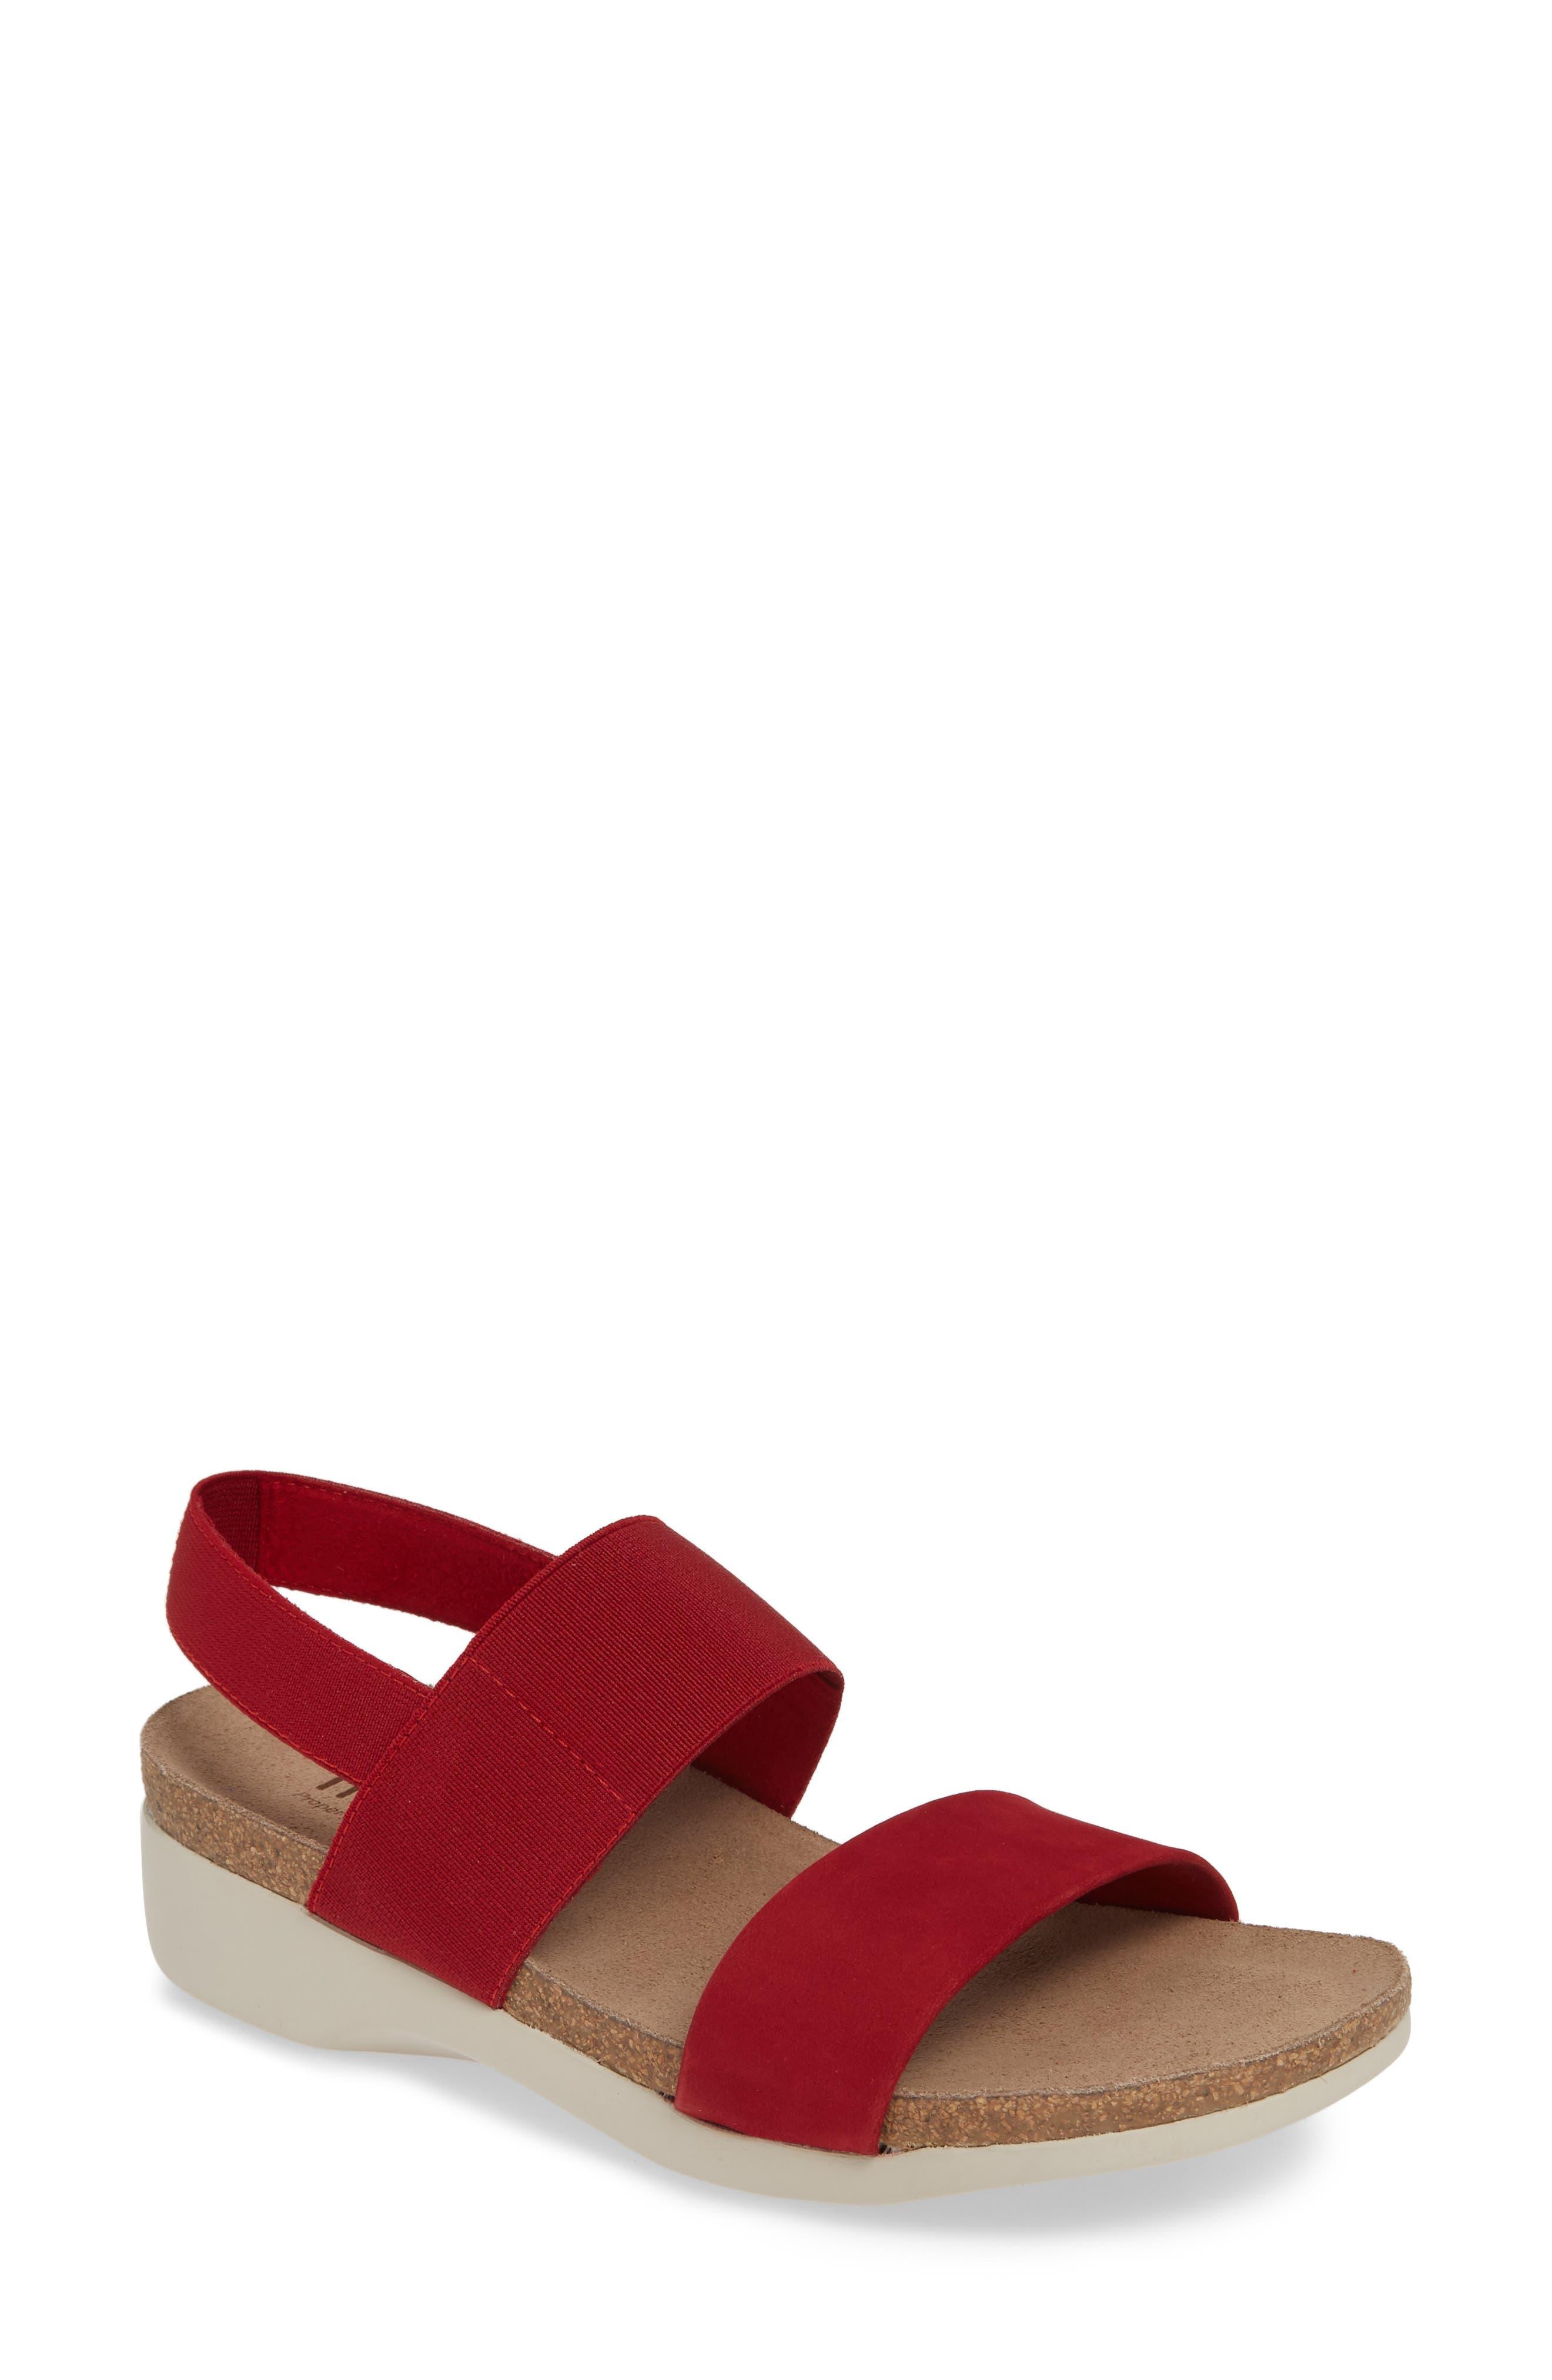 fa5bb4455d2a Women s Slingback Sandals